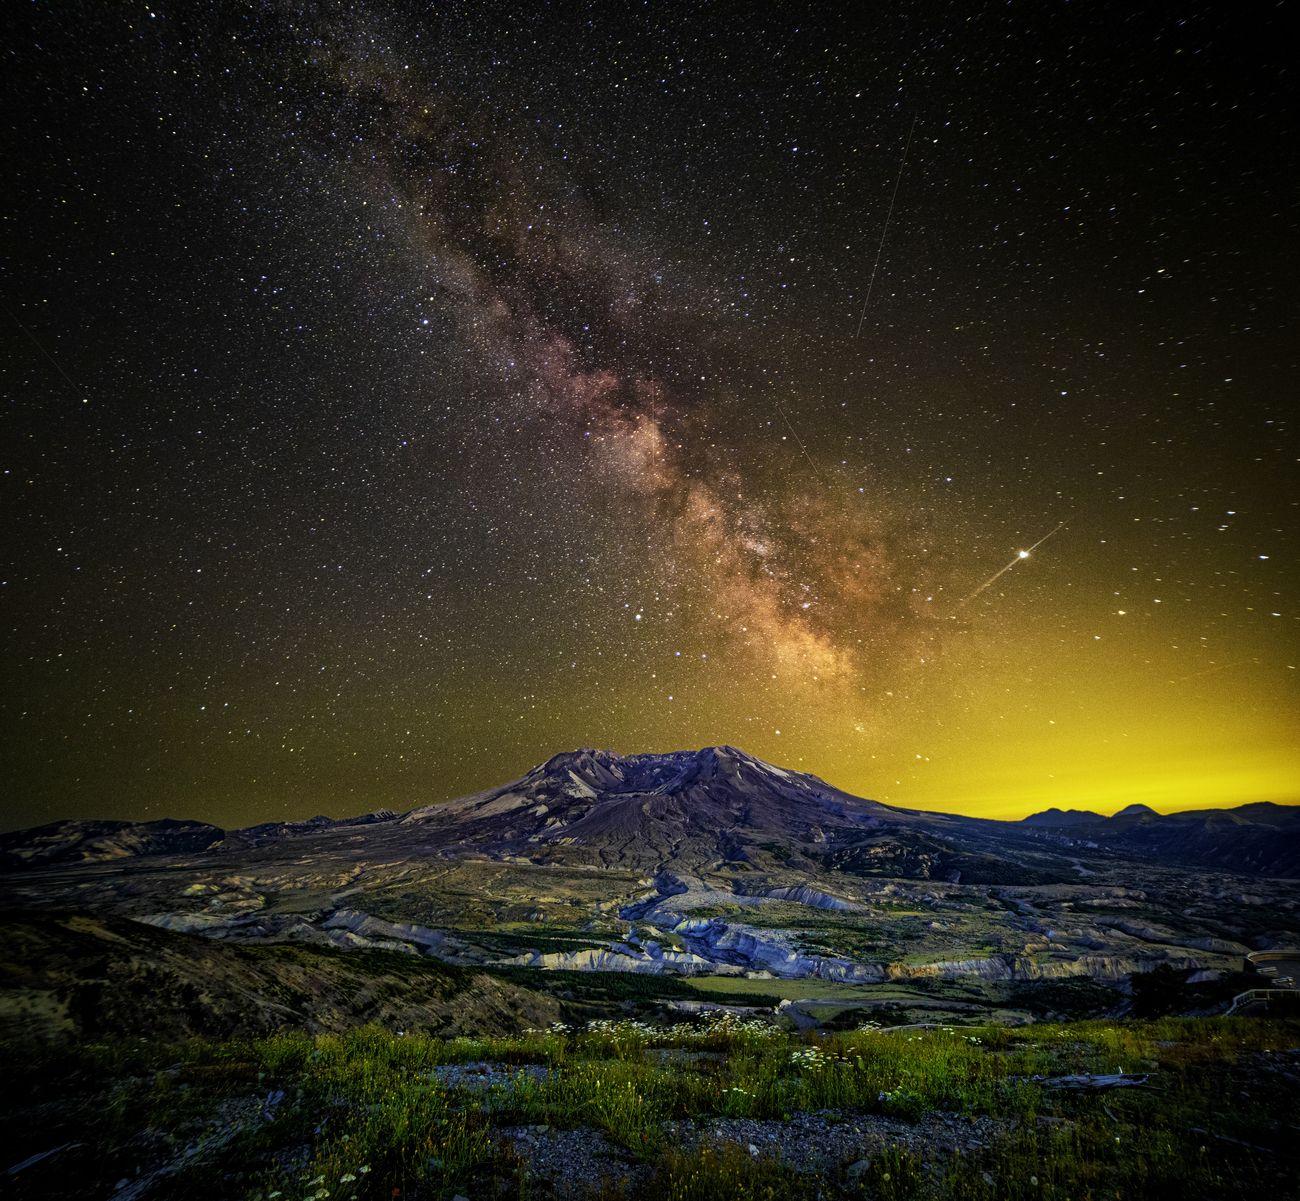 Mount St Helens in July